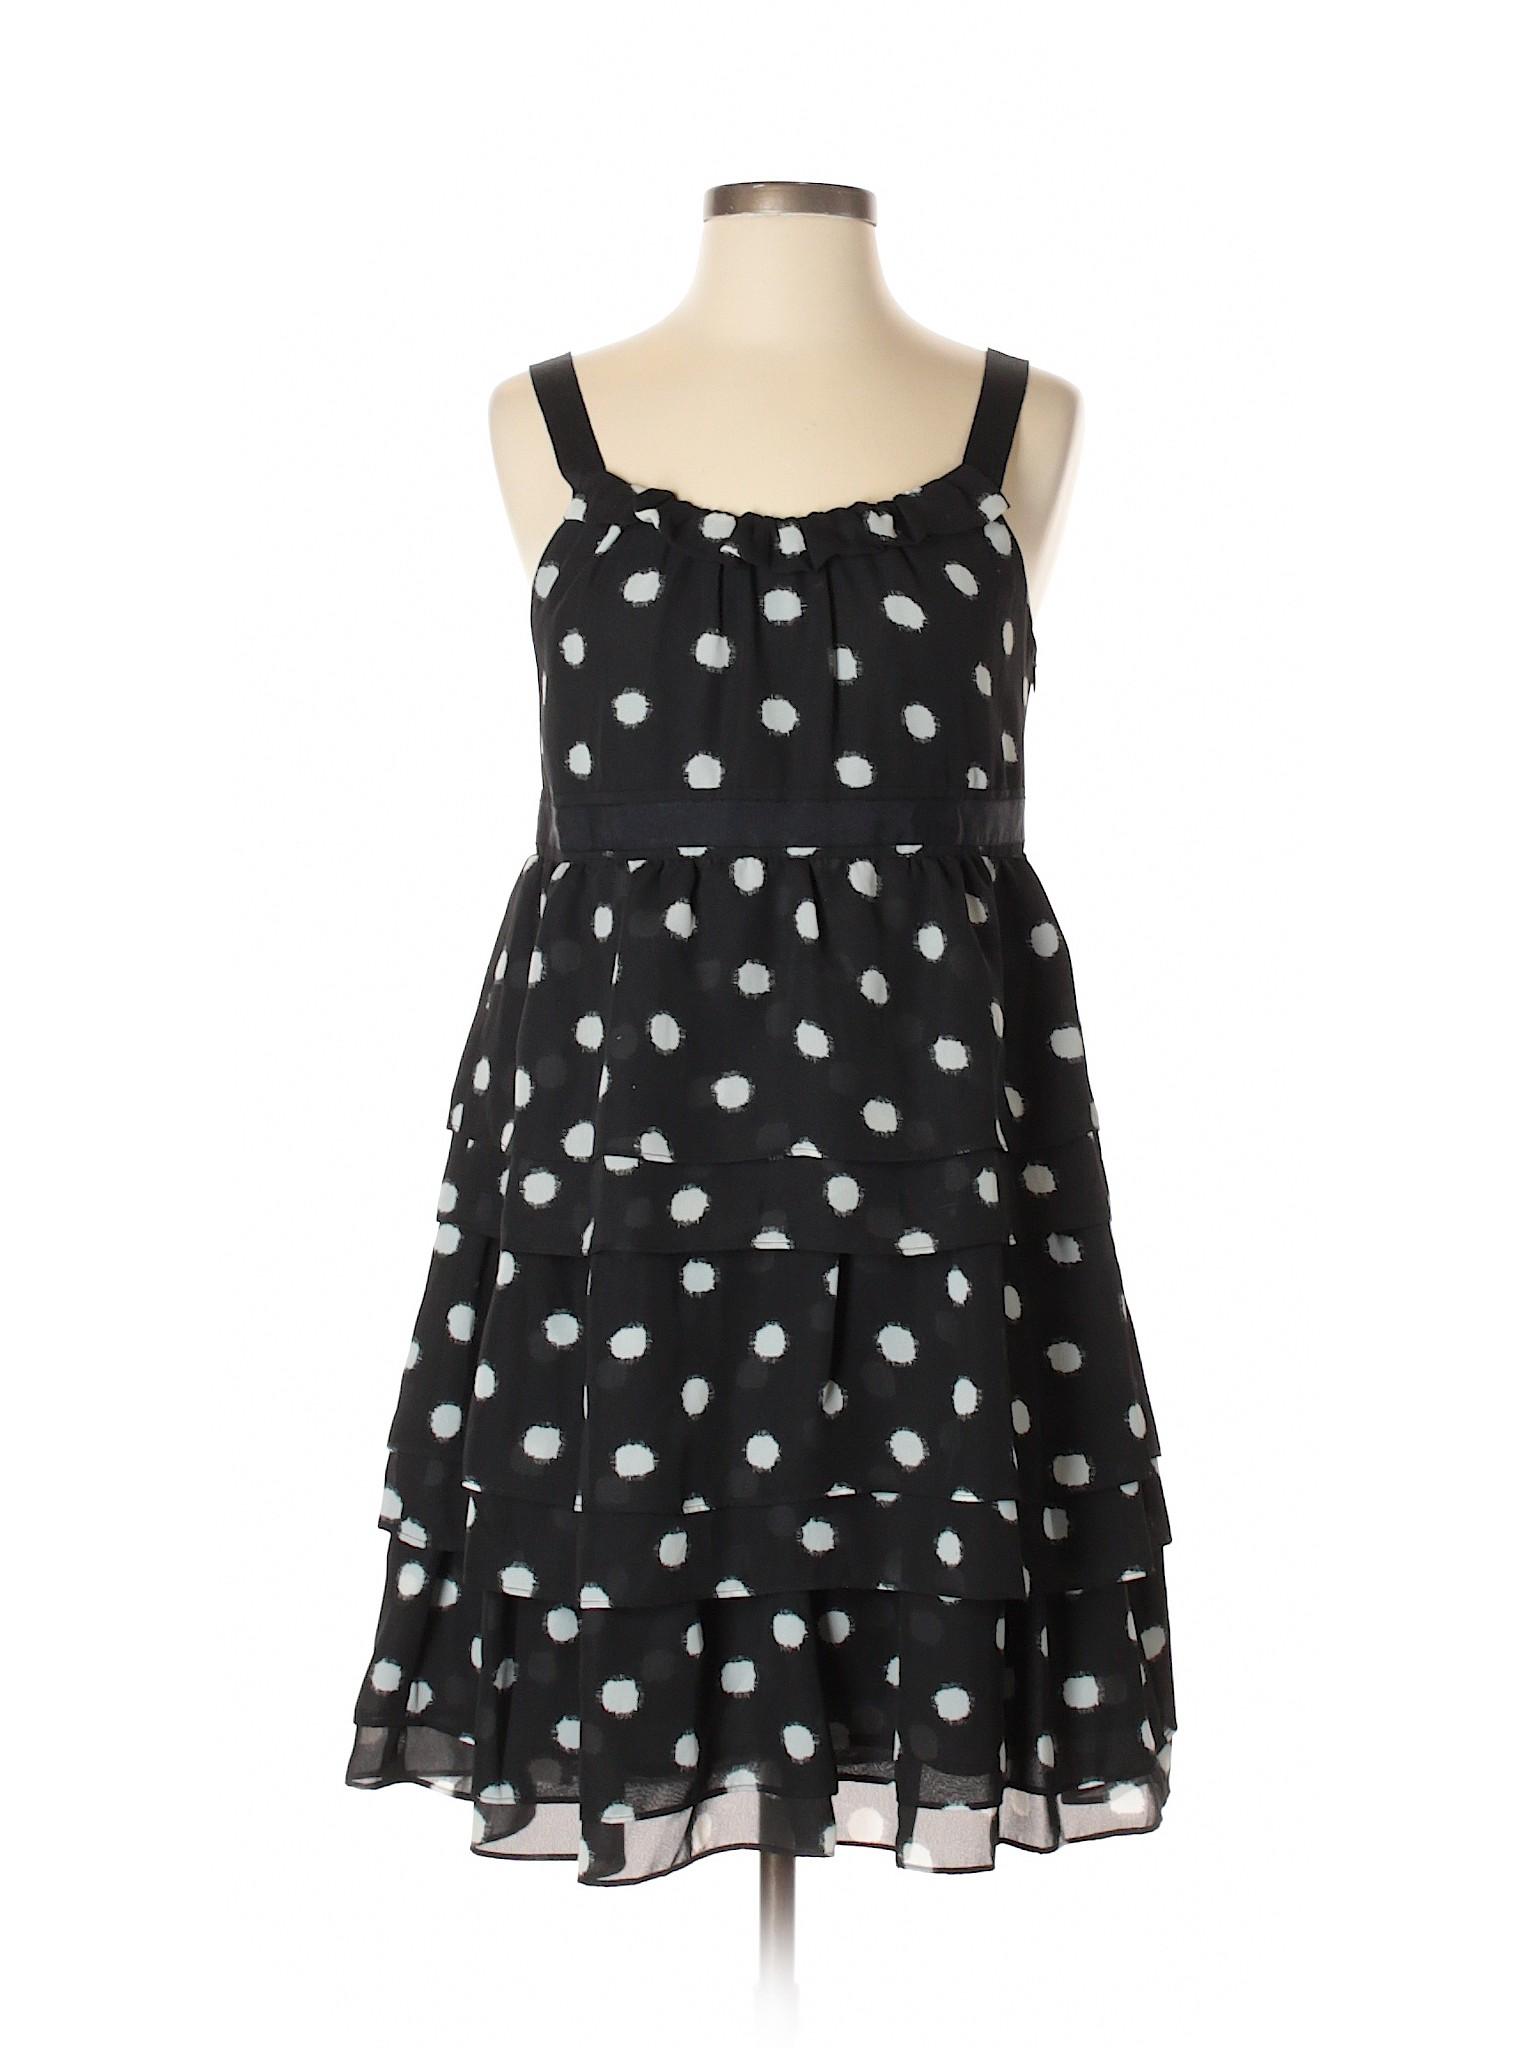 Ann Boutique Dress Taylor LOFT Casual winter SwnUwq51